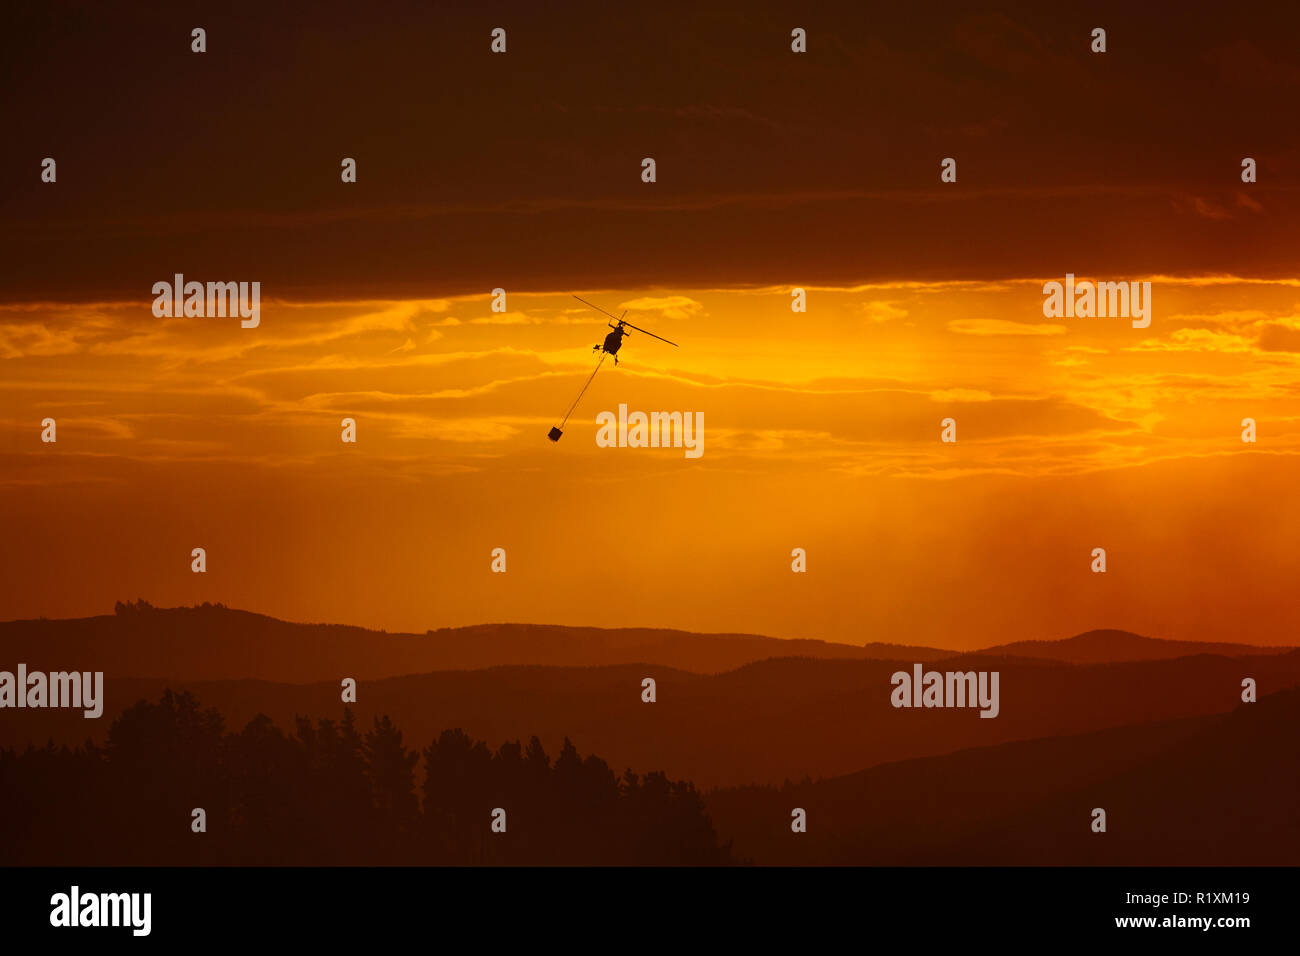 Smokey sunset and helicopter fighting fire at Burnside, Dunedin, South Island, New Zealand - Stock Image